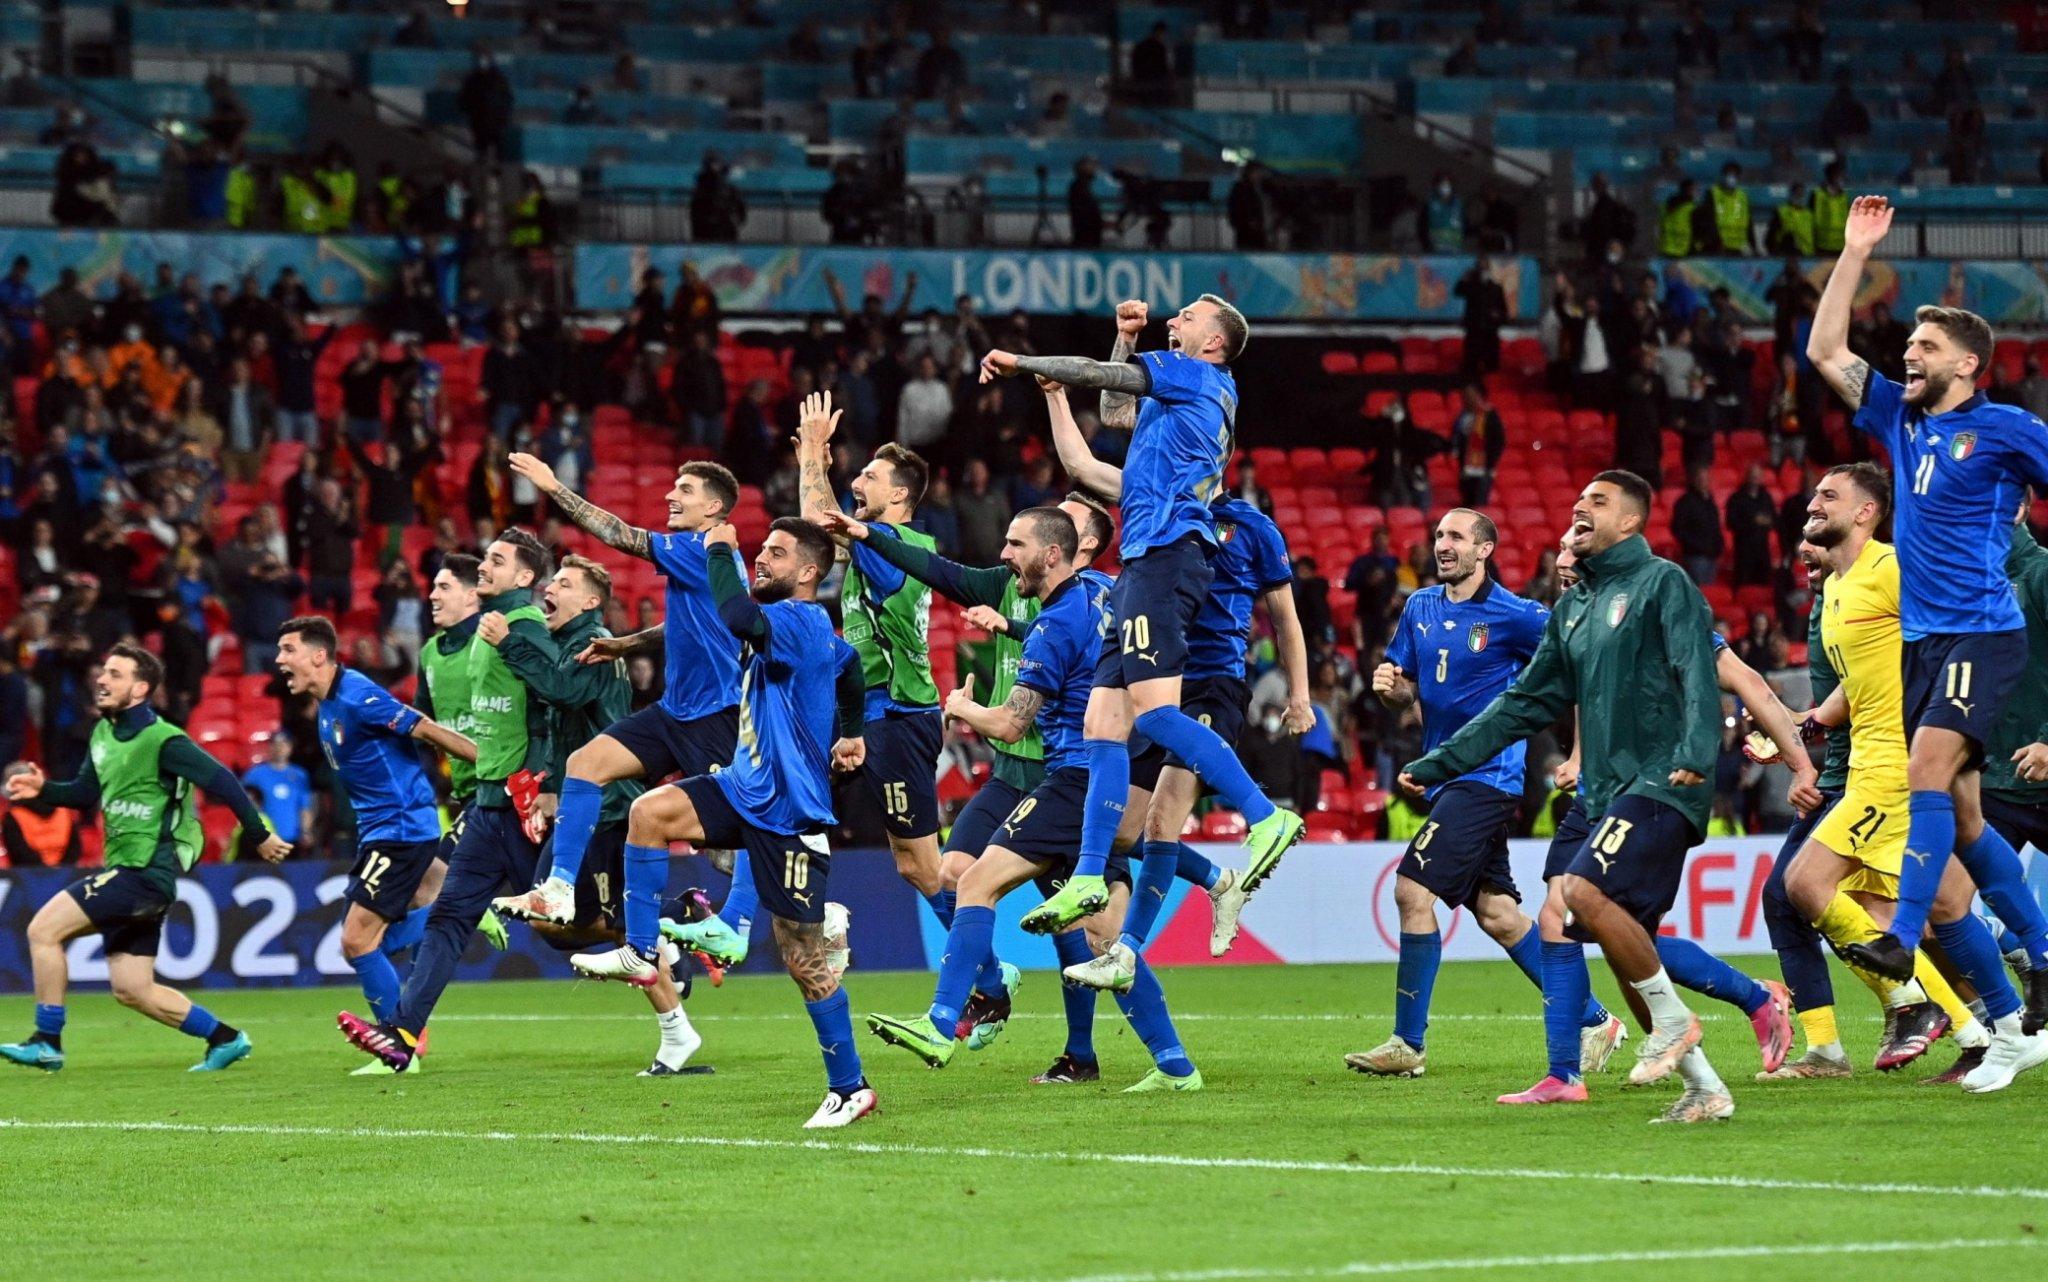 Europei 2021, Italia-Inghilterra: la finale - cover